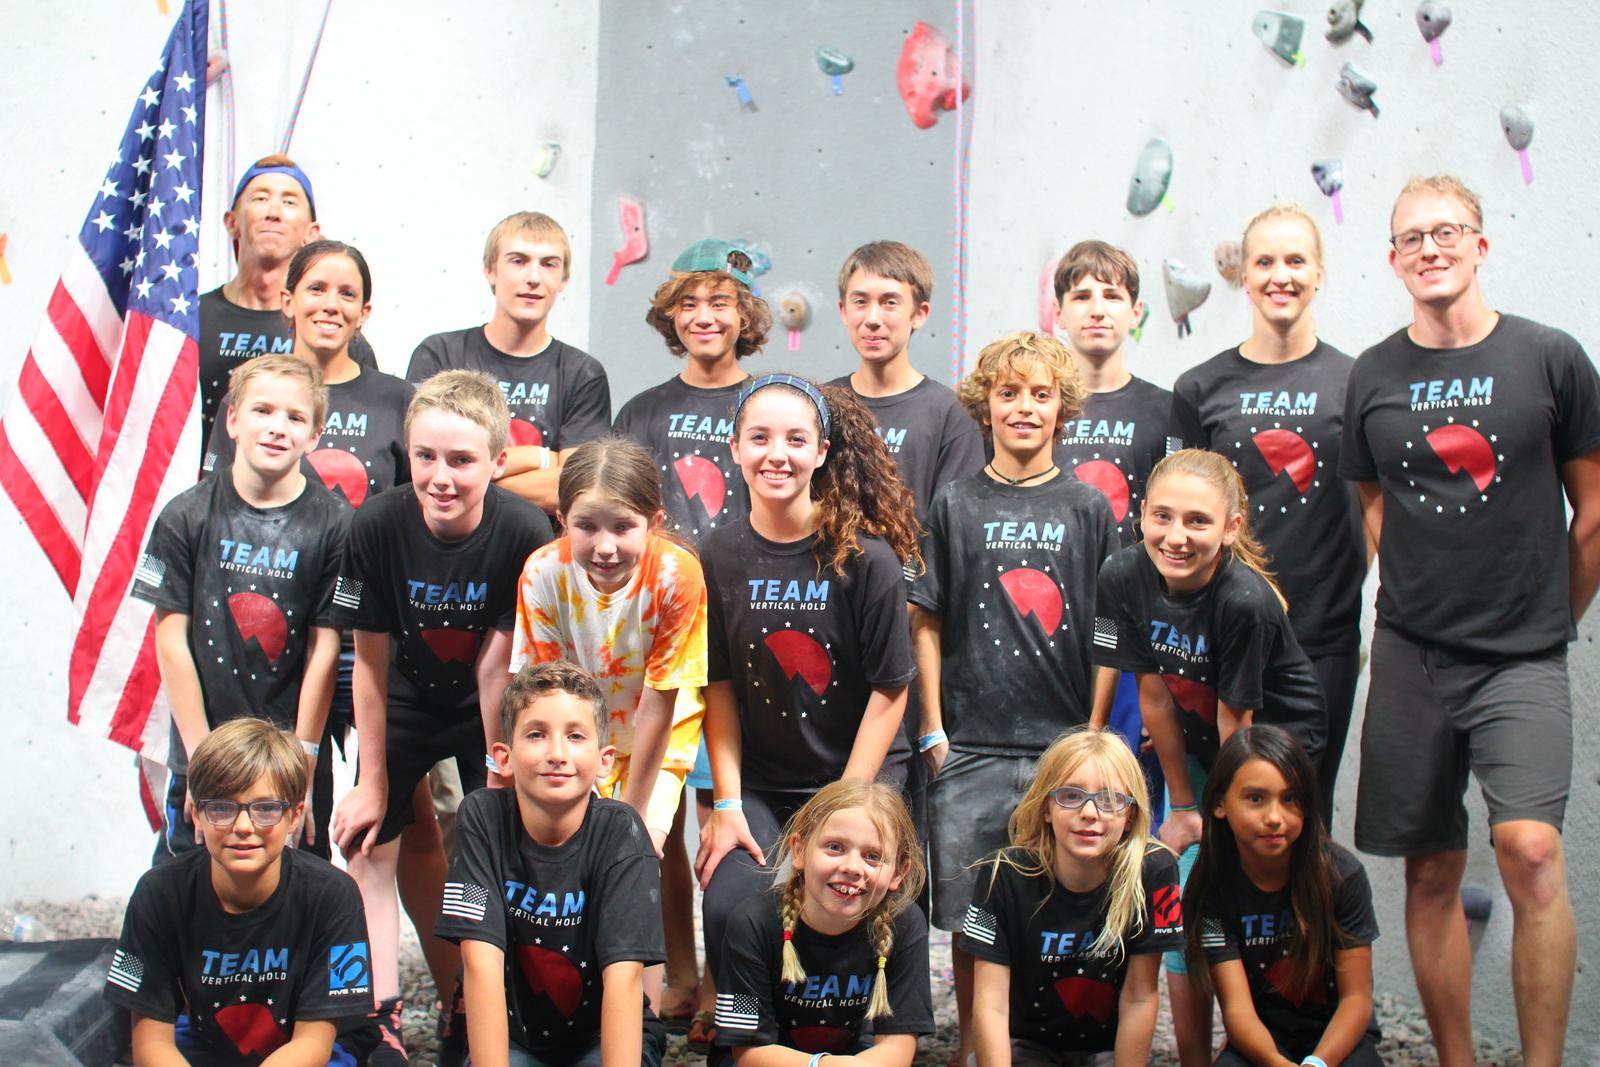 vertical-hold-youth-team-002.jpg